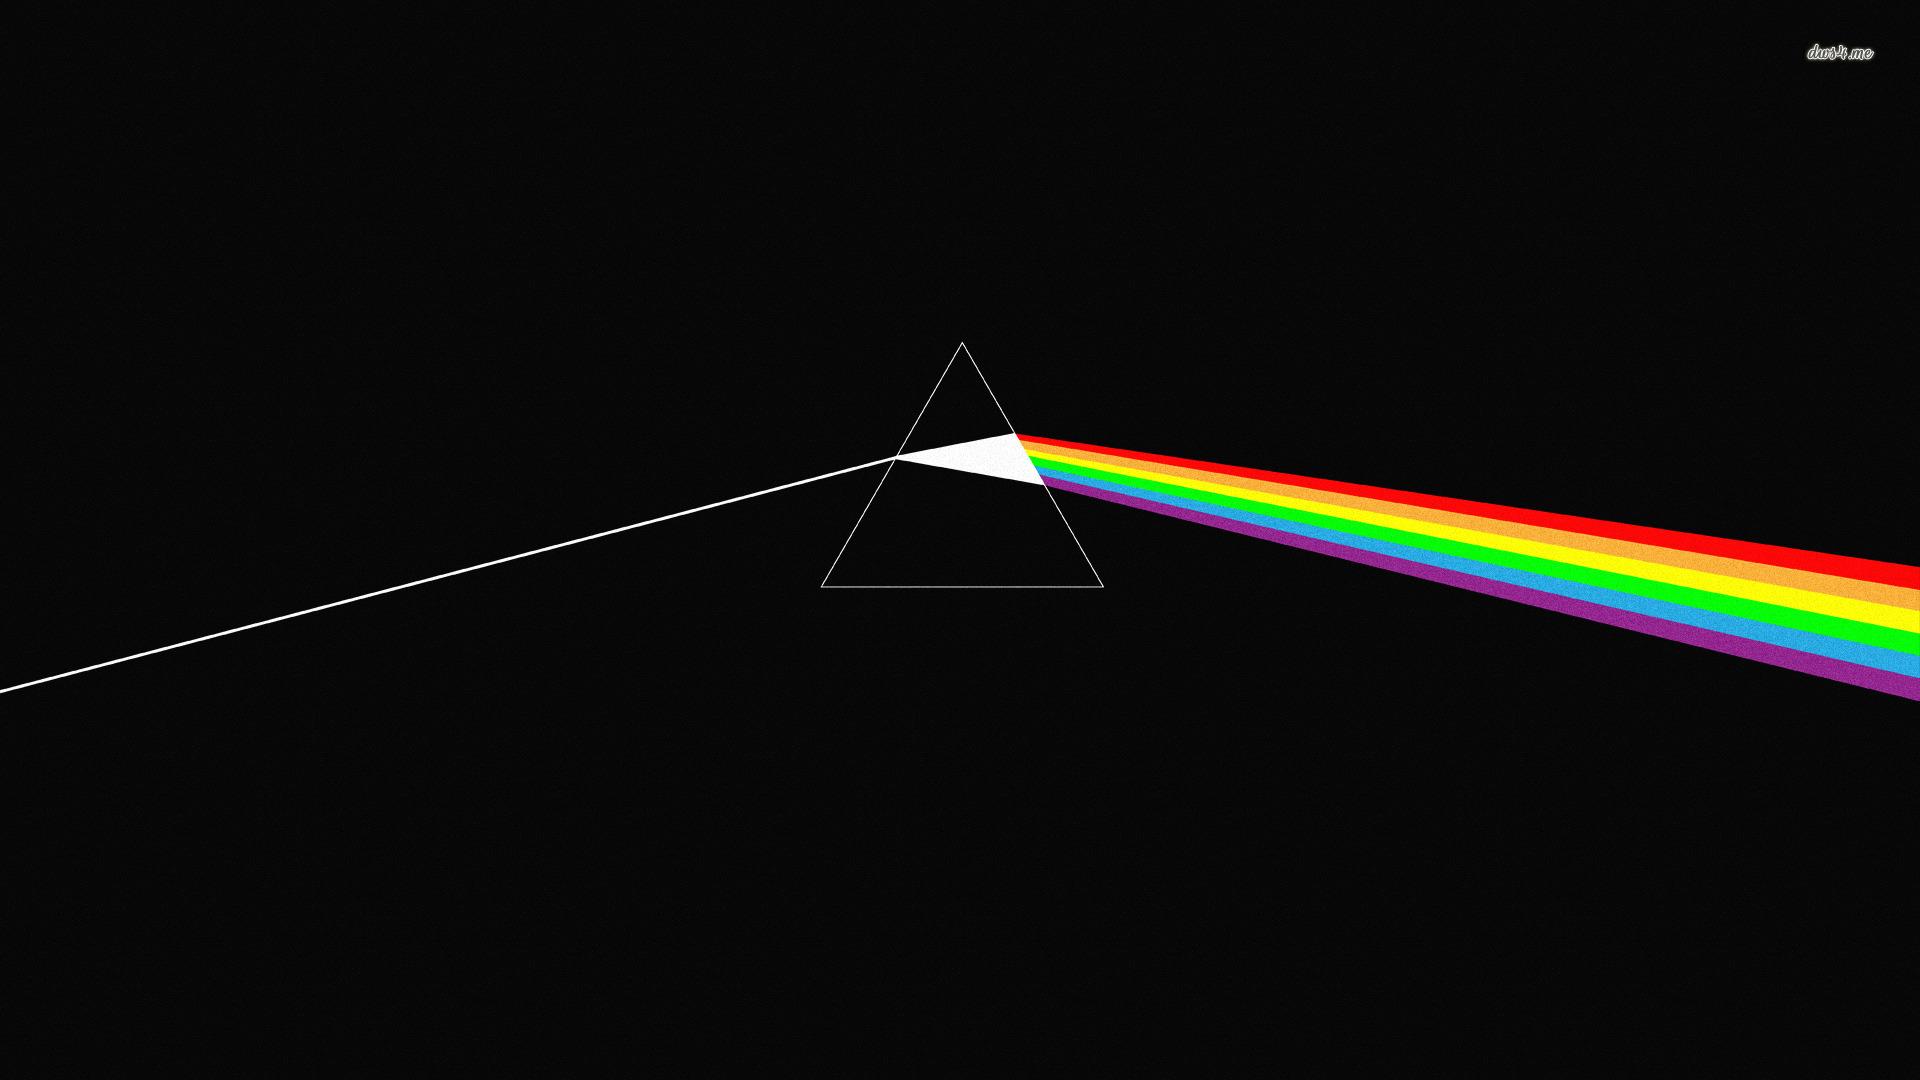 Pink Floyd Dark Side Of The Moon wallpaper 1920x1080